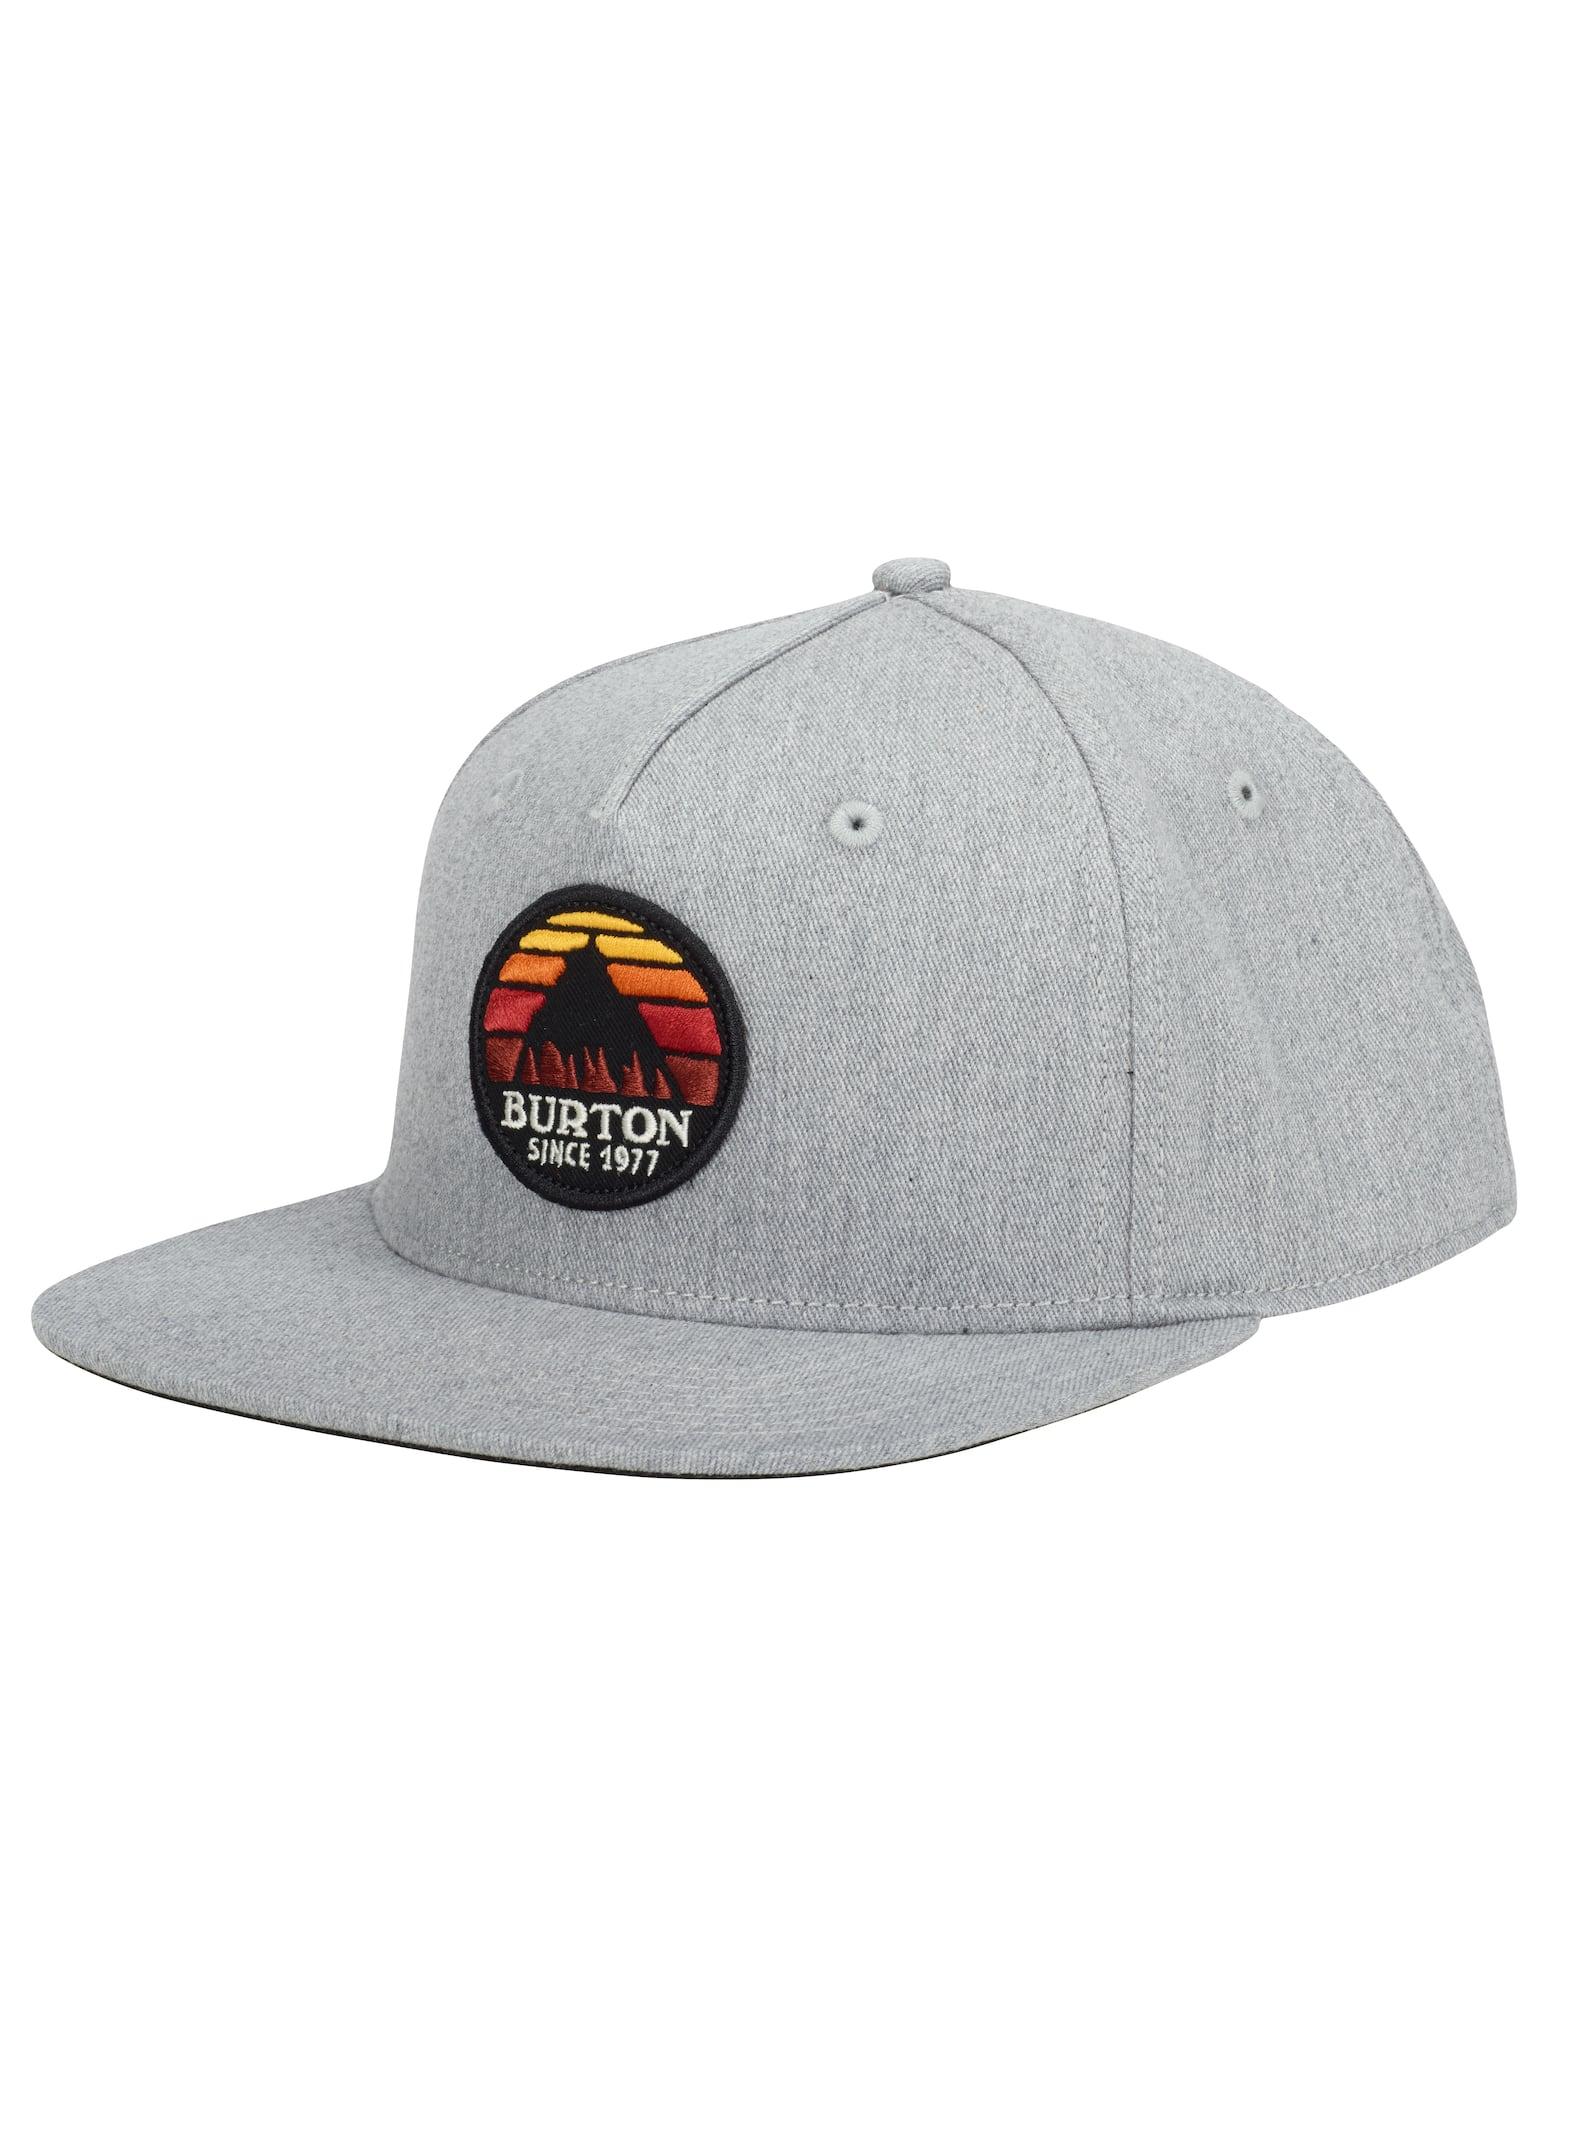 0d0268fa335 Men s Hats   Beanies